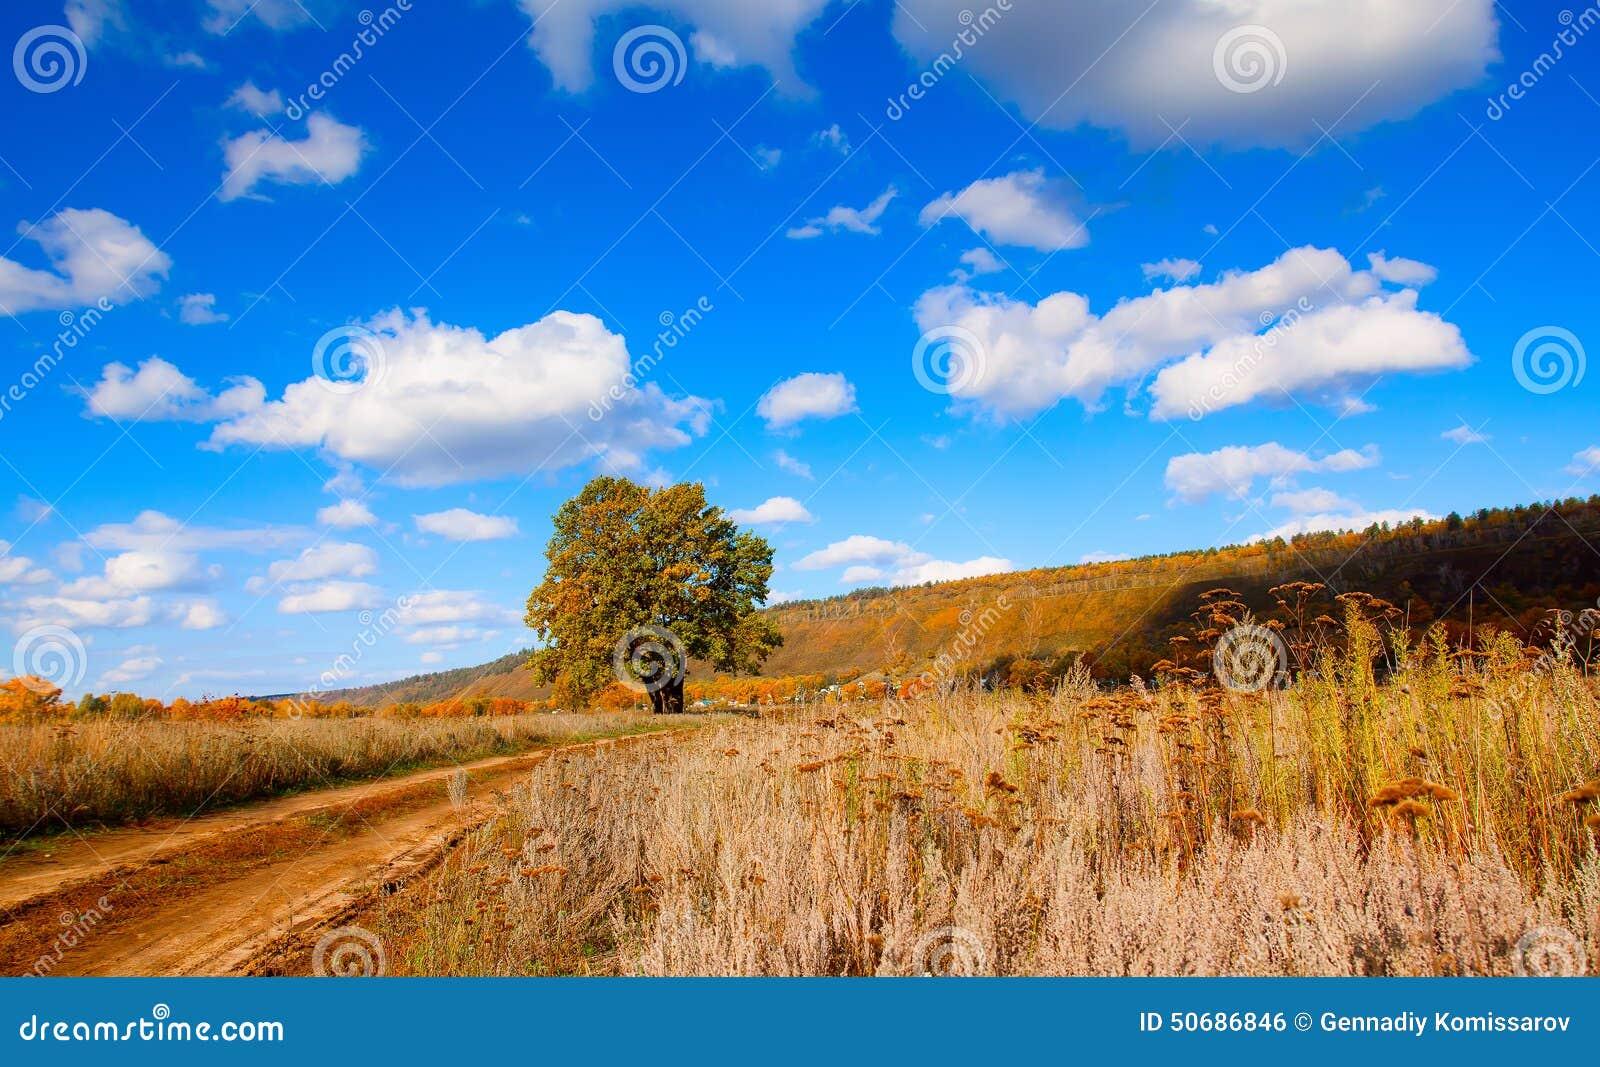 Download 9月 库存照片. 图片 包括有 黄色, 孤独, 方式, 的treadled, eventing, 结构树 - 50686846